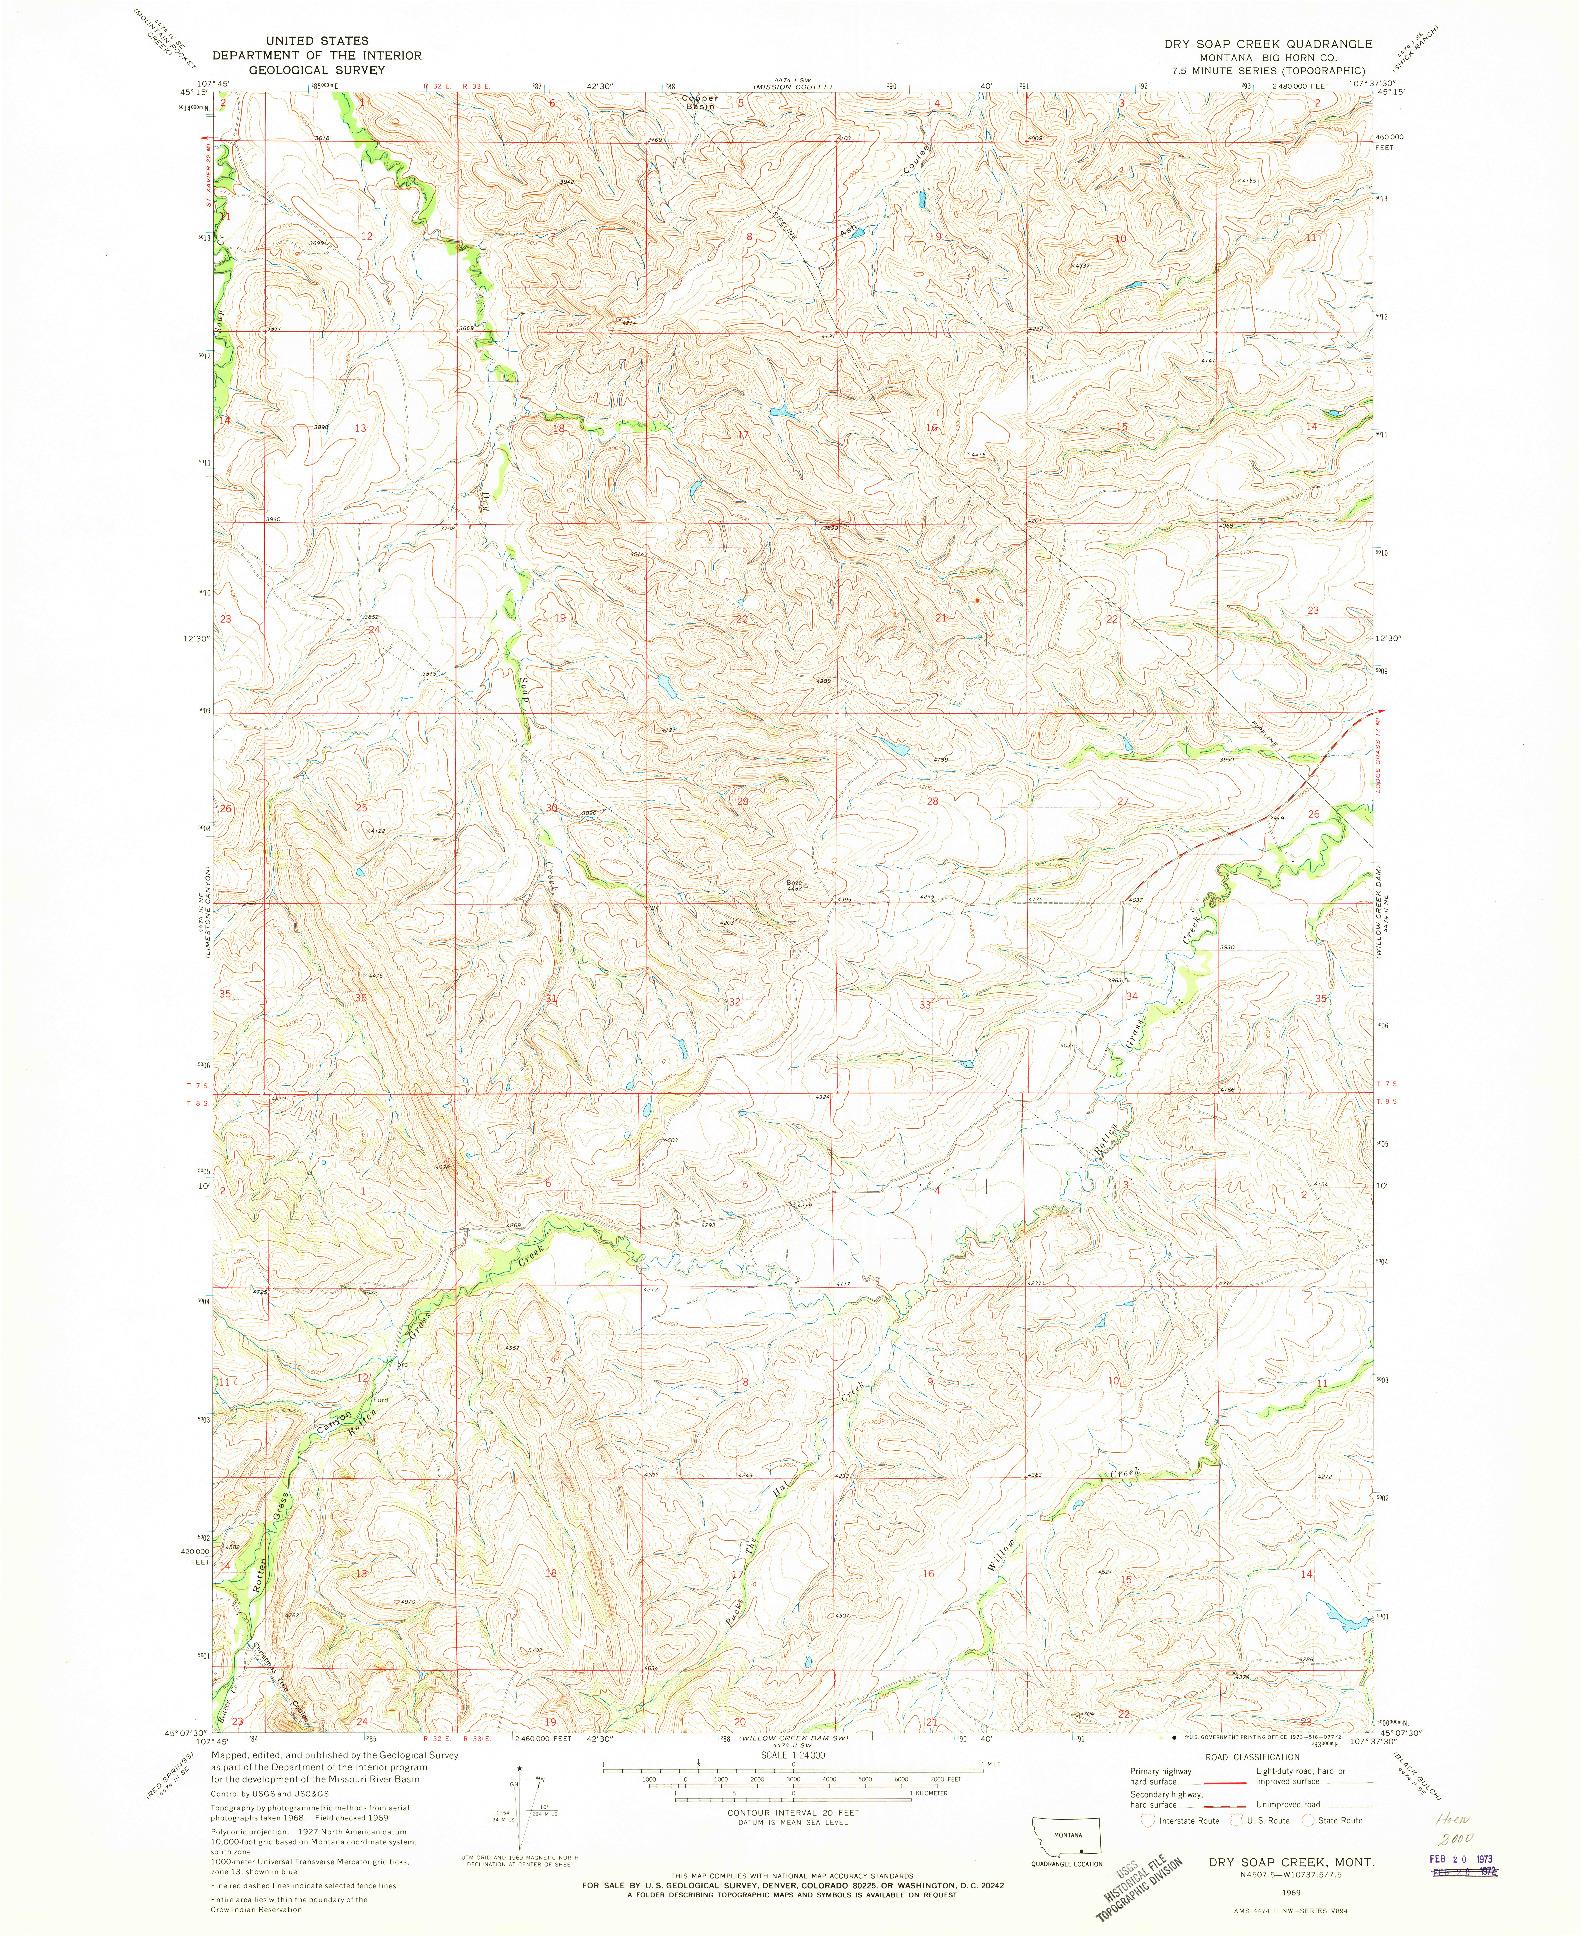 USGS 1:24000-SCALE QUADRANGLE FOR DRY SOAP CREEK, MT 1969